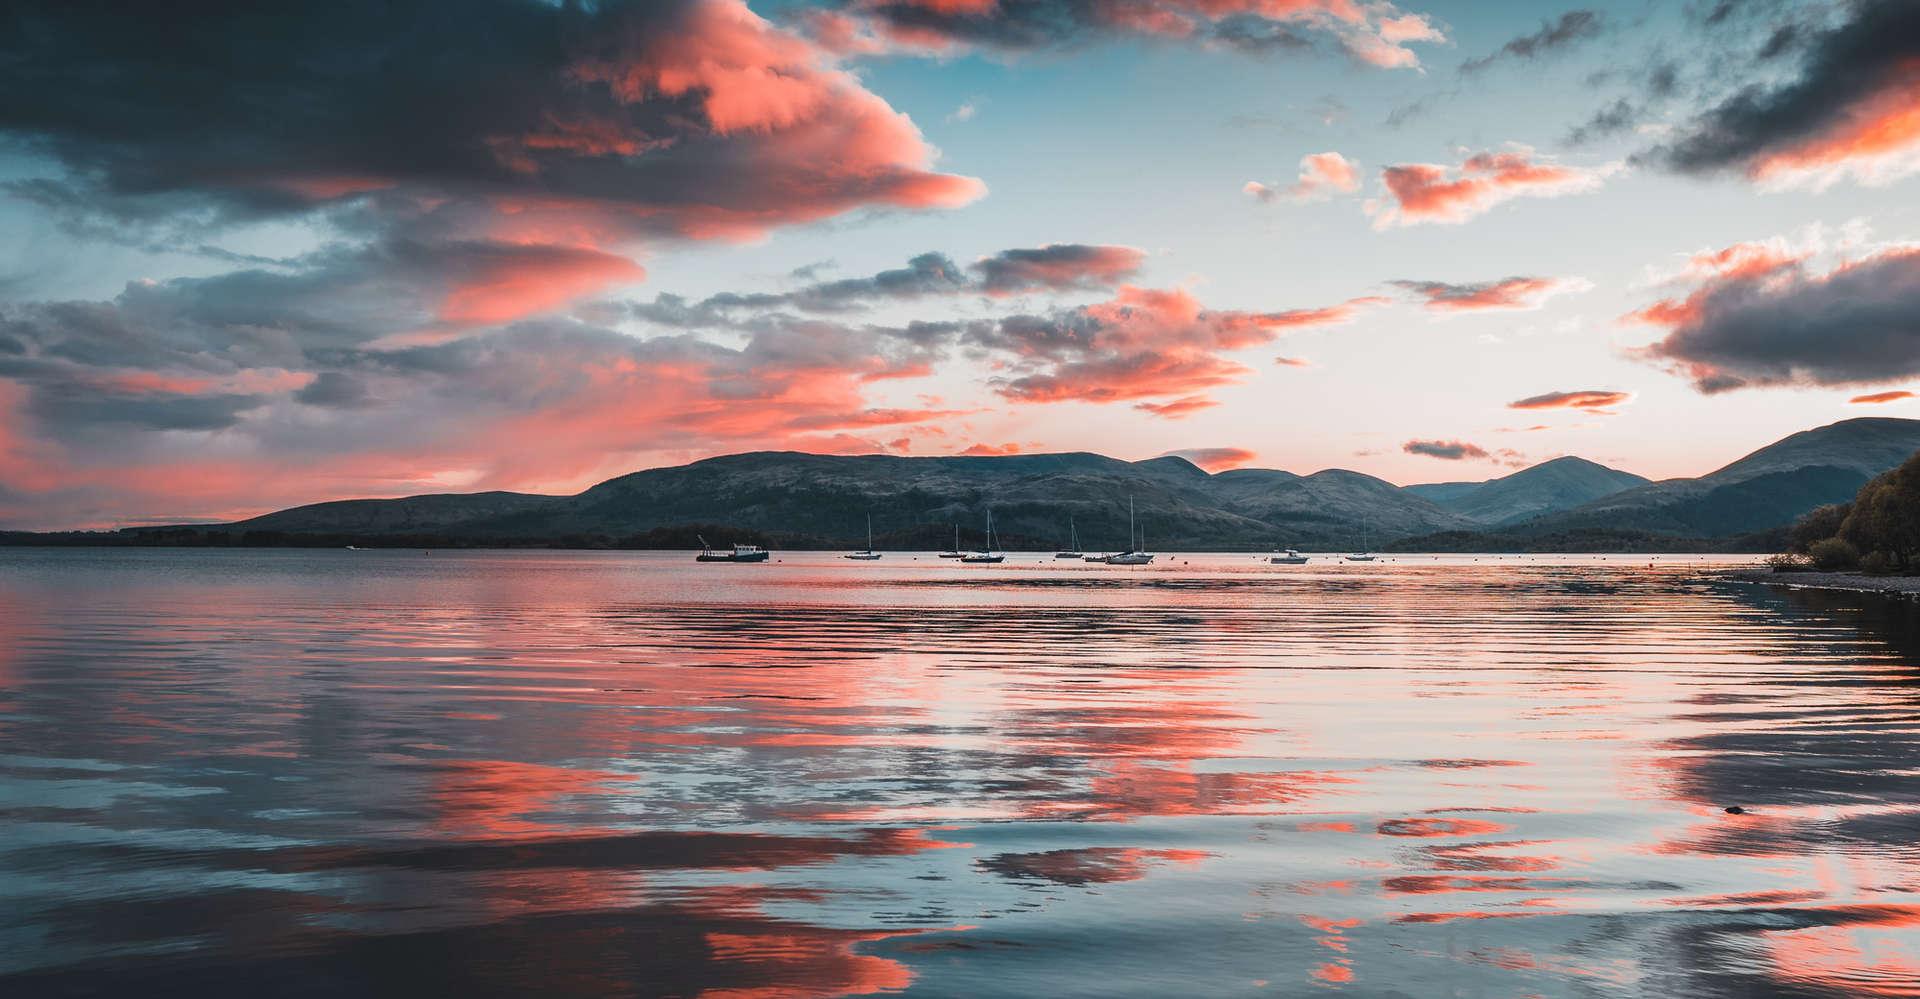 loch at sunset in scotland